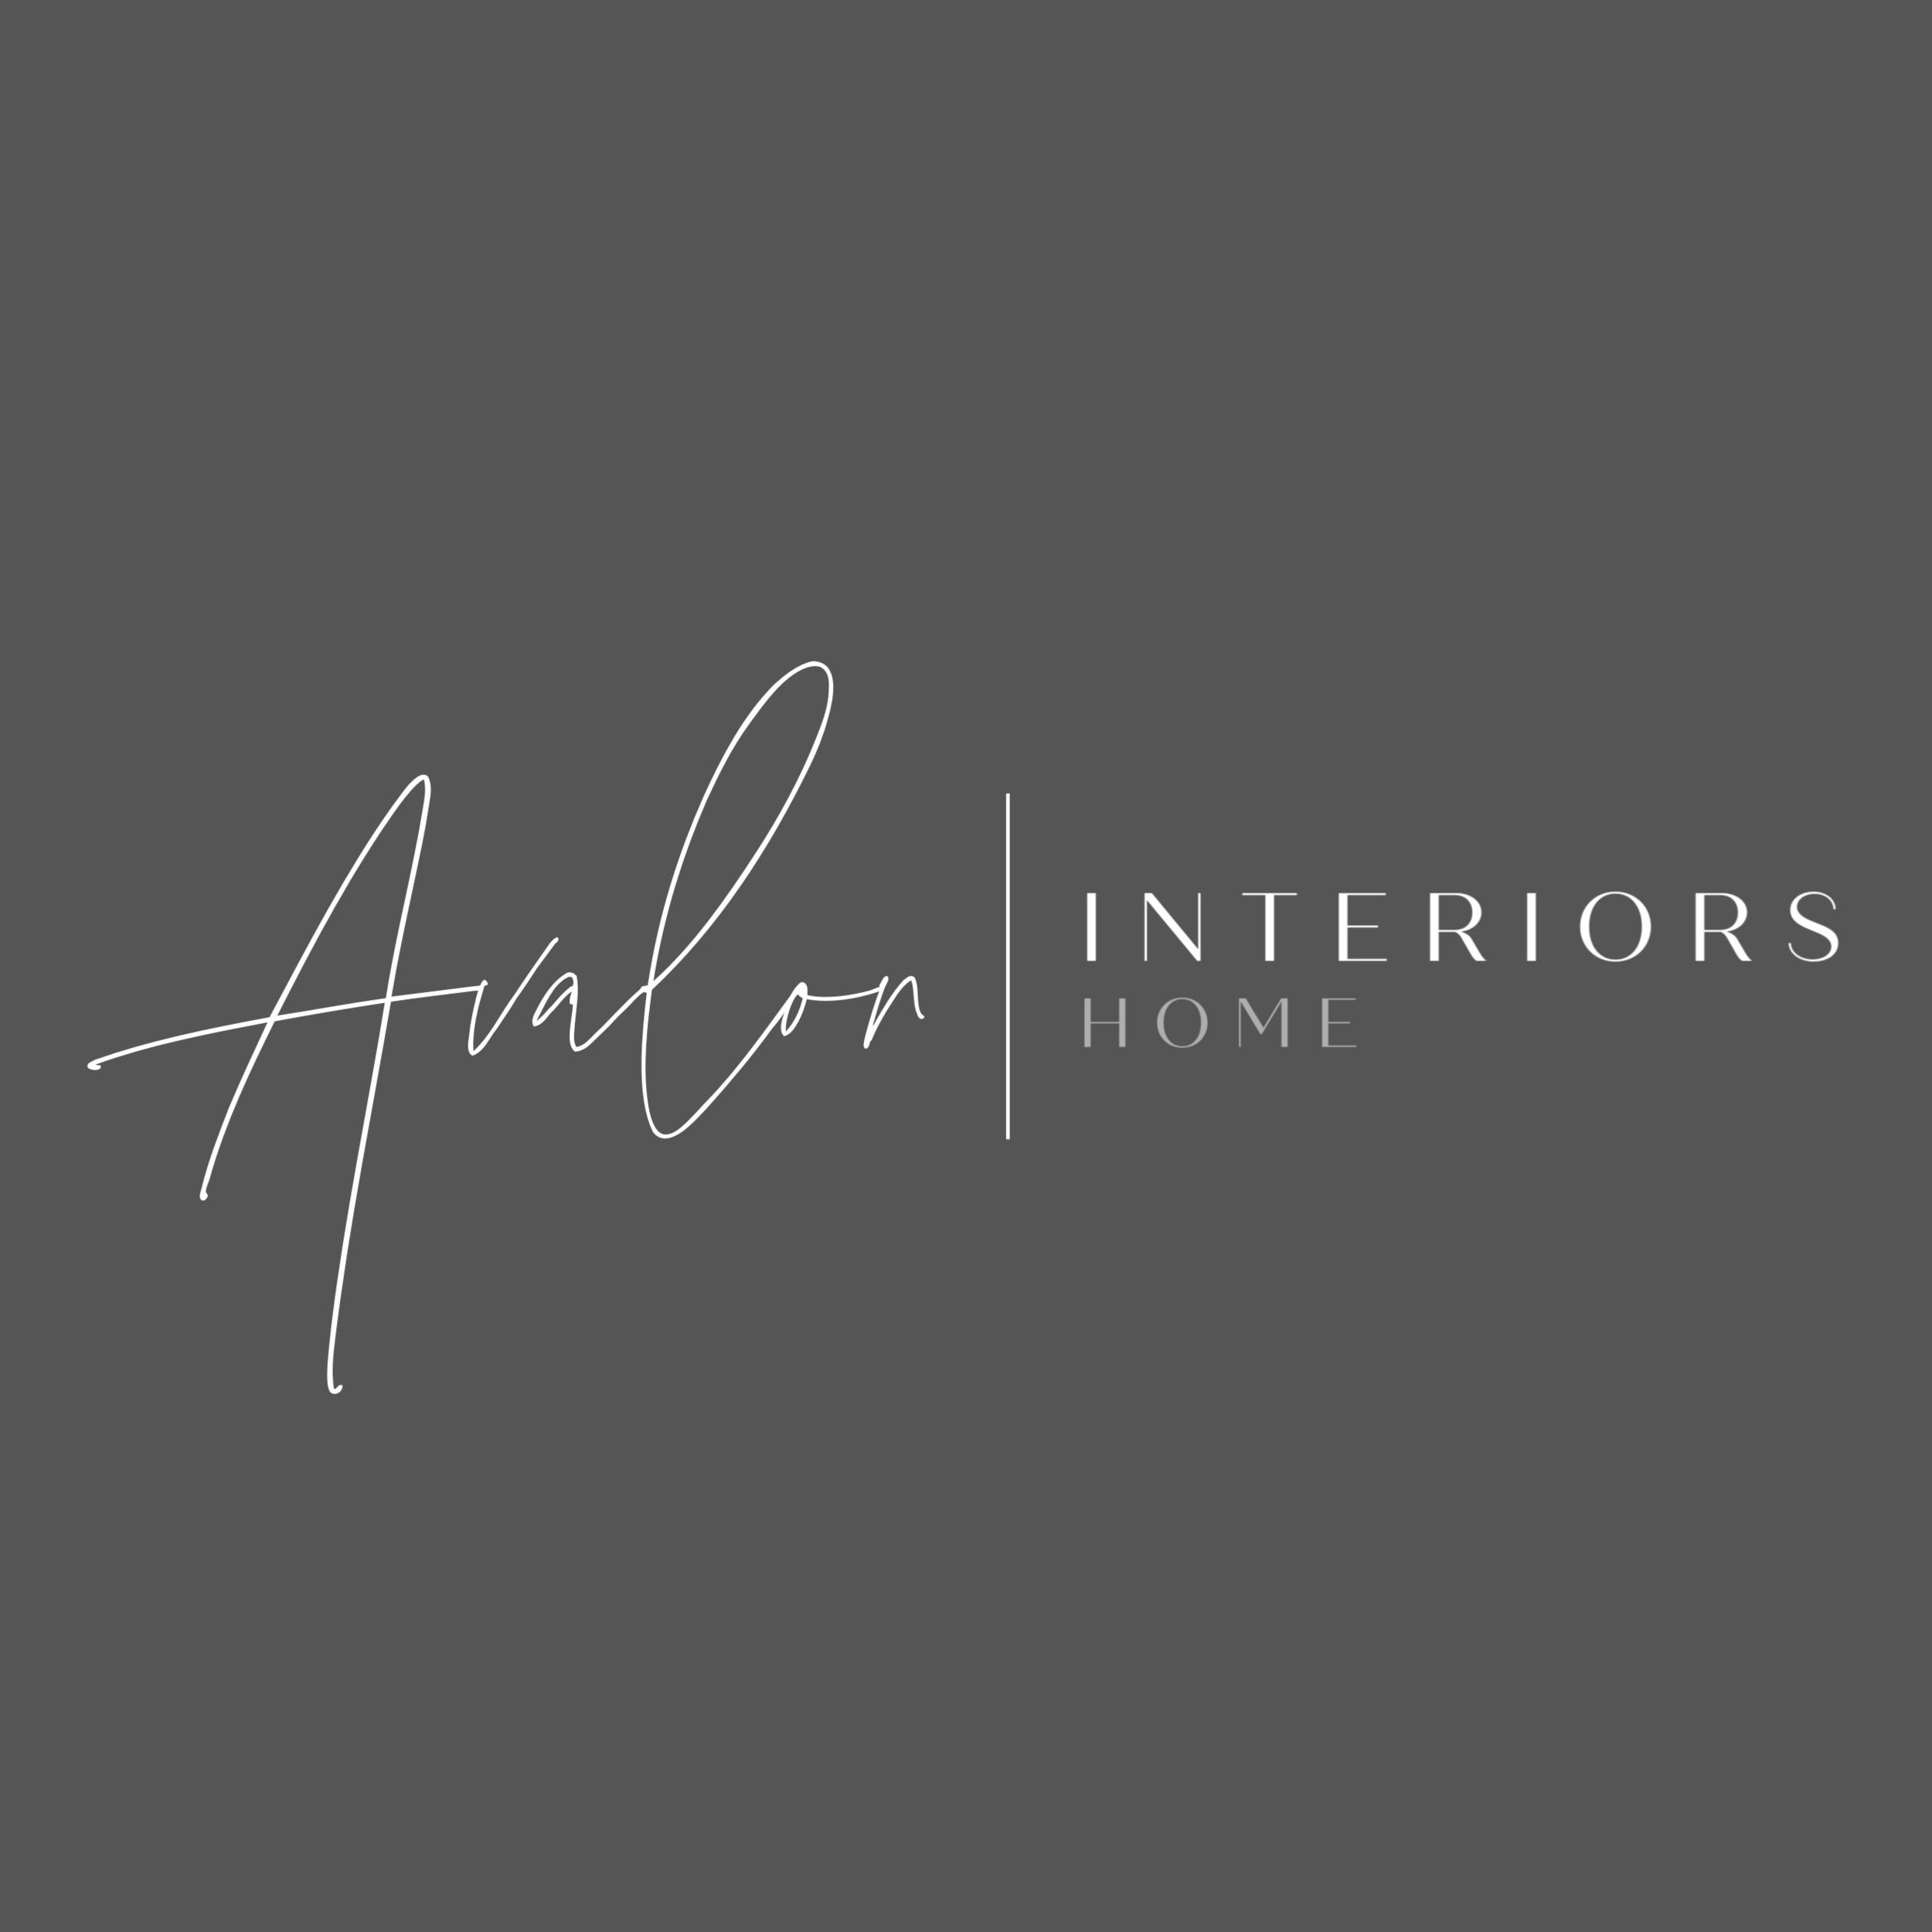 avalon interiors home invert logo.png